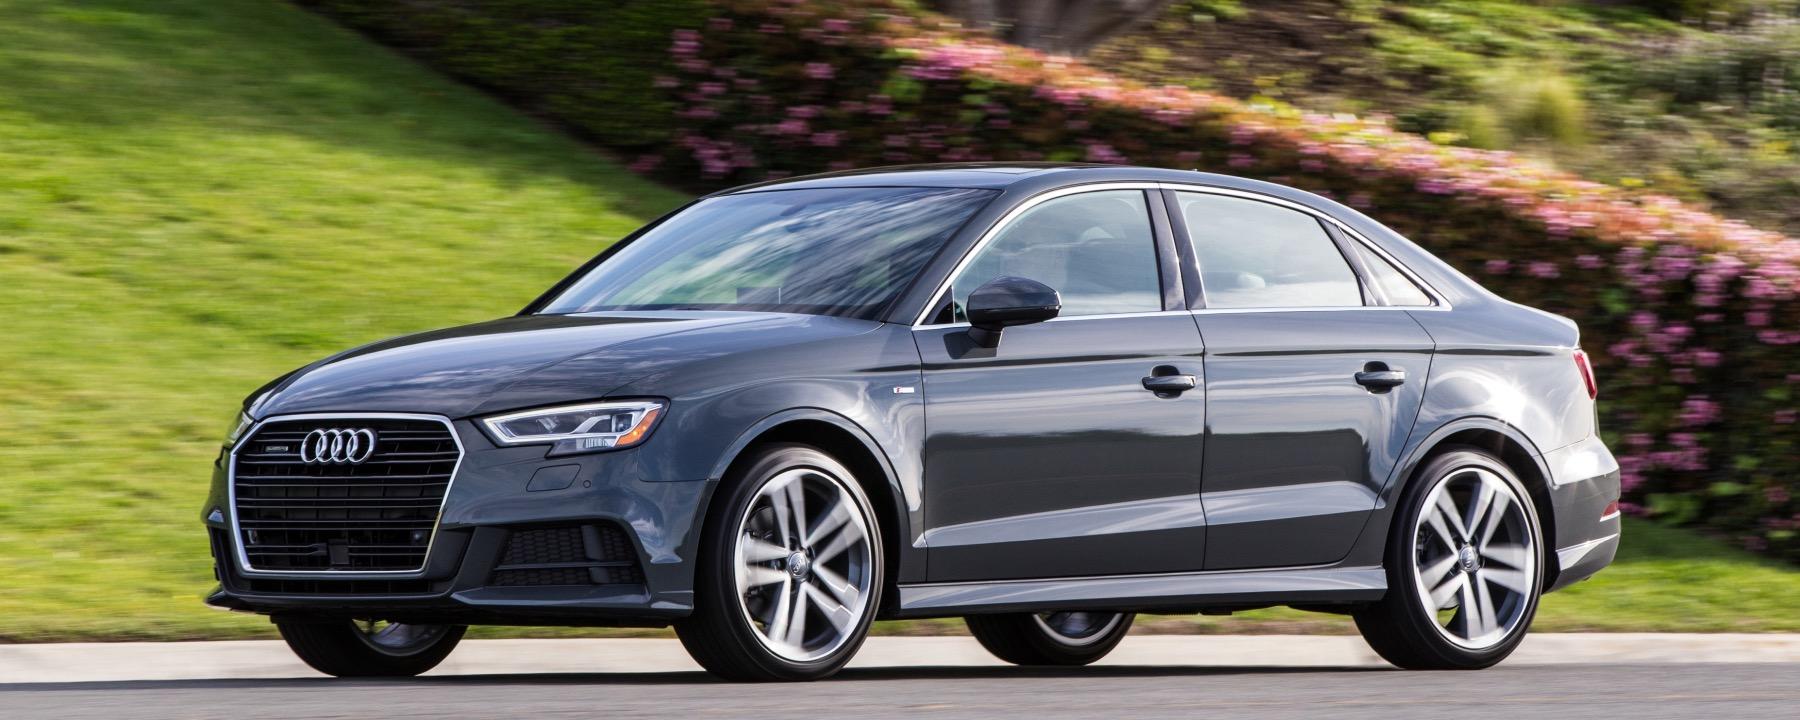 BRAVO To The 2018 Audi A3 - indiGO Auto Group Blog